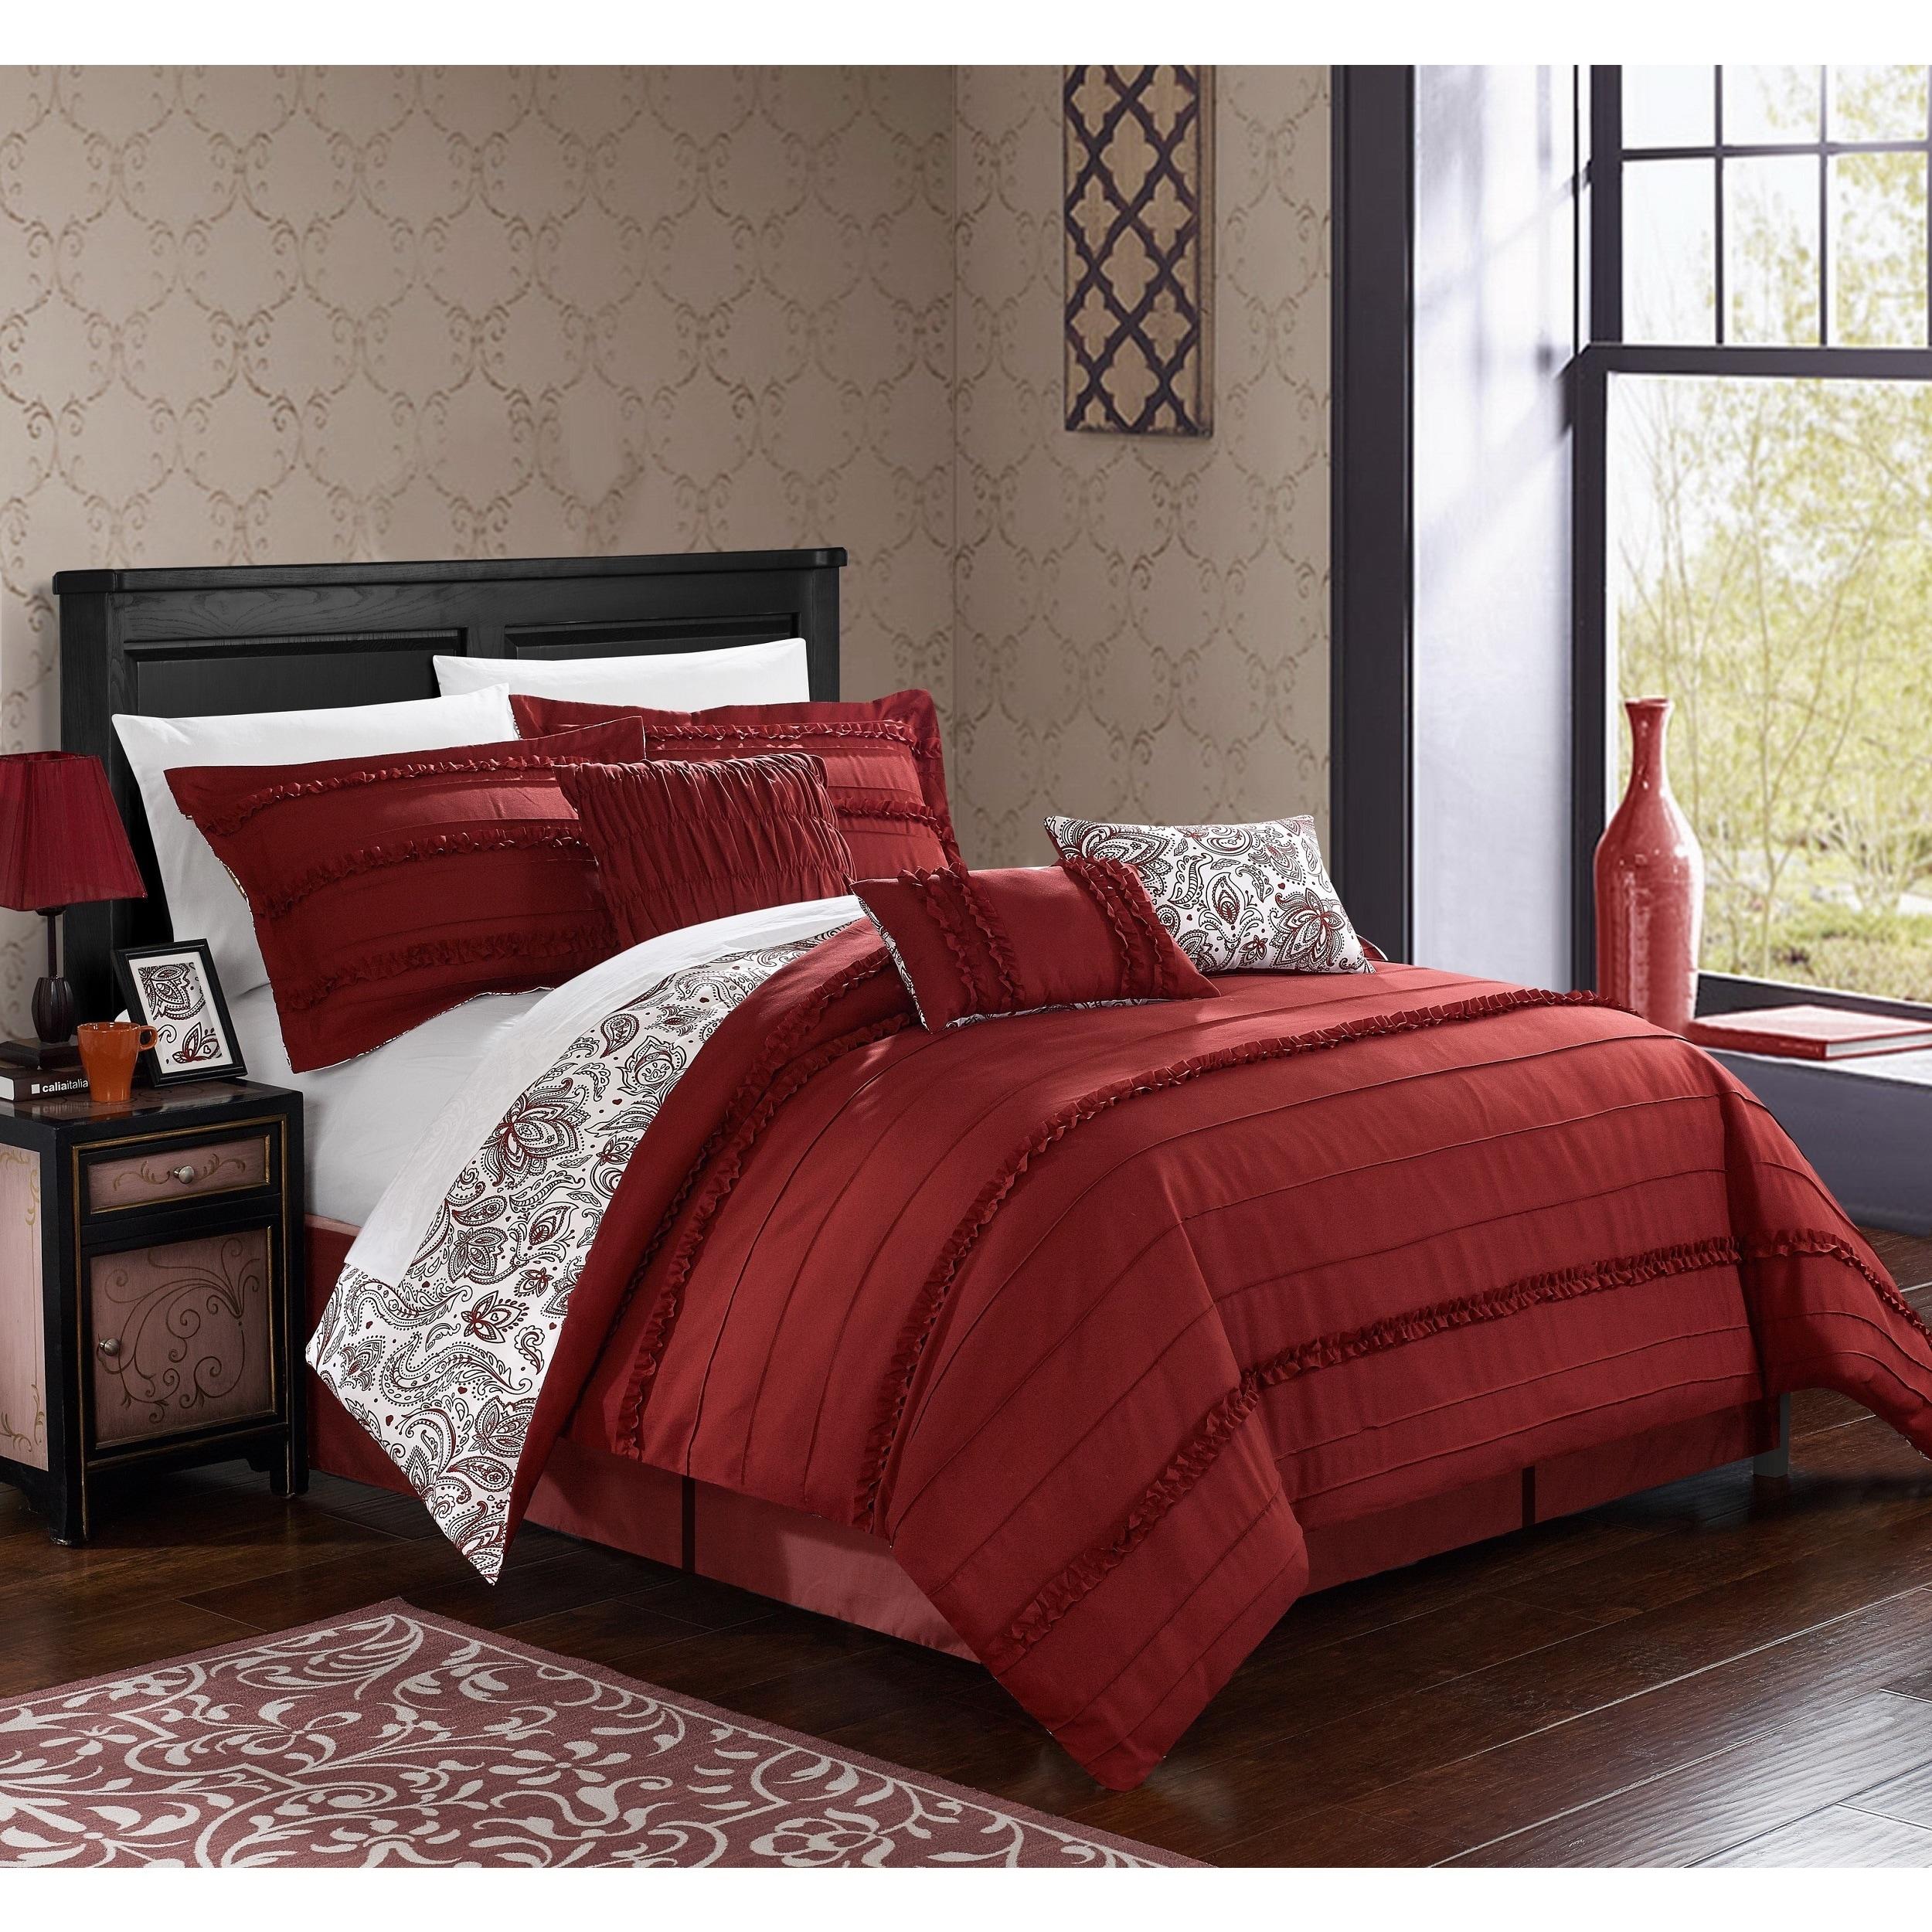 Porch & Den Montavilla Sherman Brick Reversible 7-piece Comforter Set